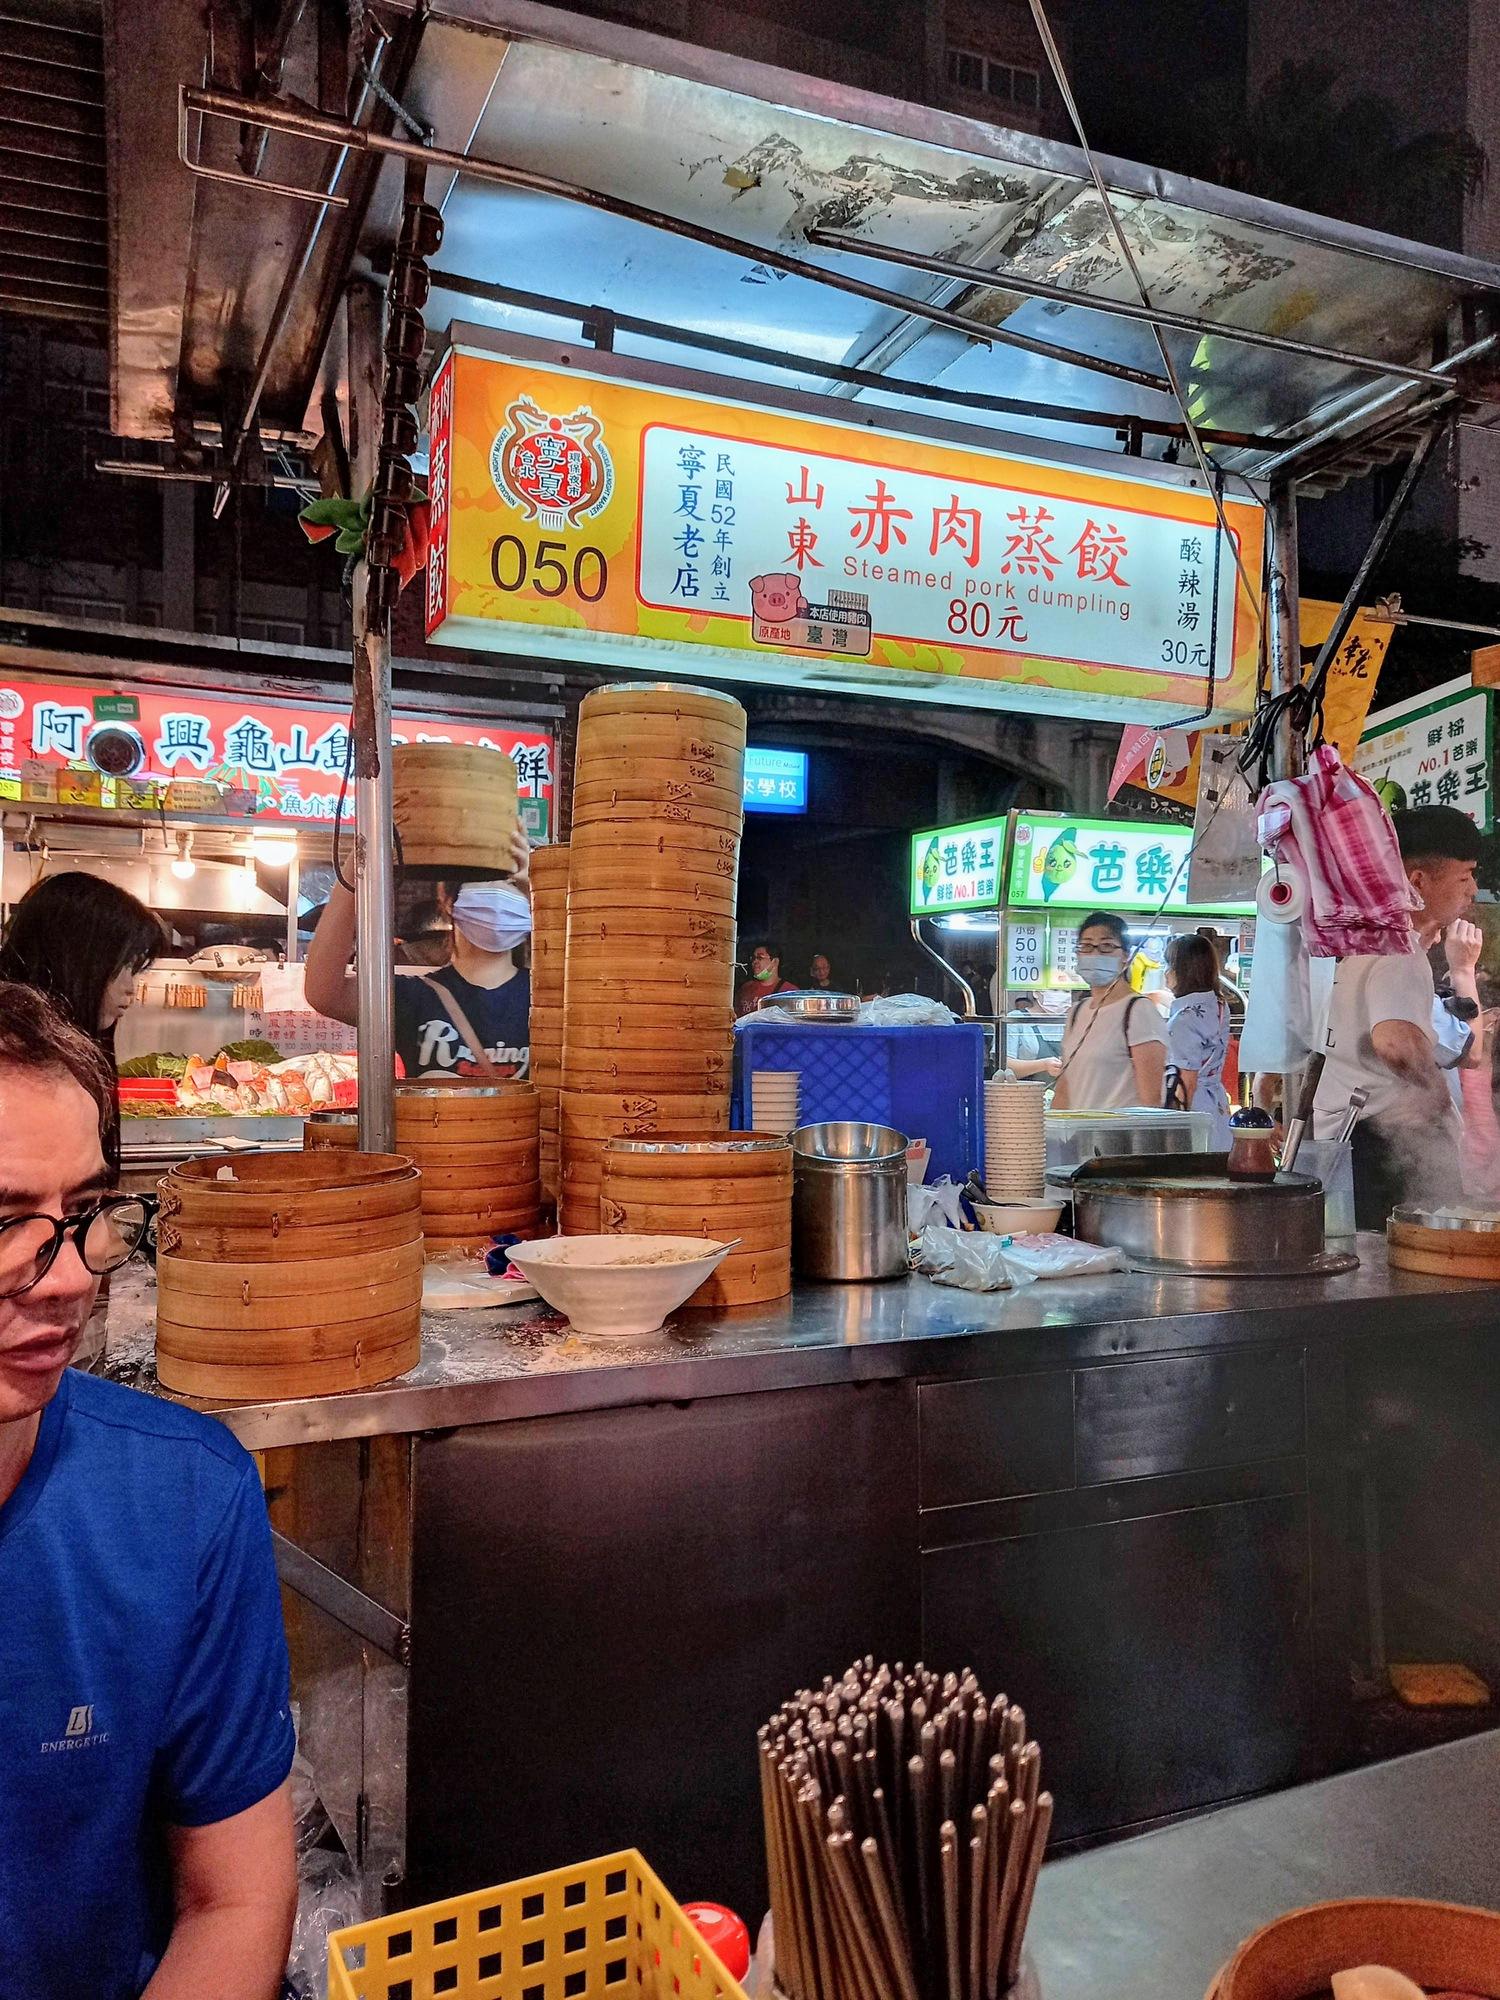 Steamed Pork Dumplings 豬肉餃子 at Ningxia Night Market 寧夏夜市